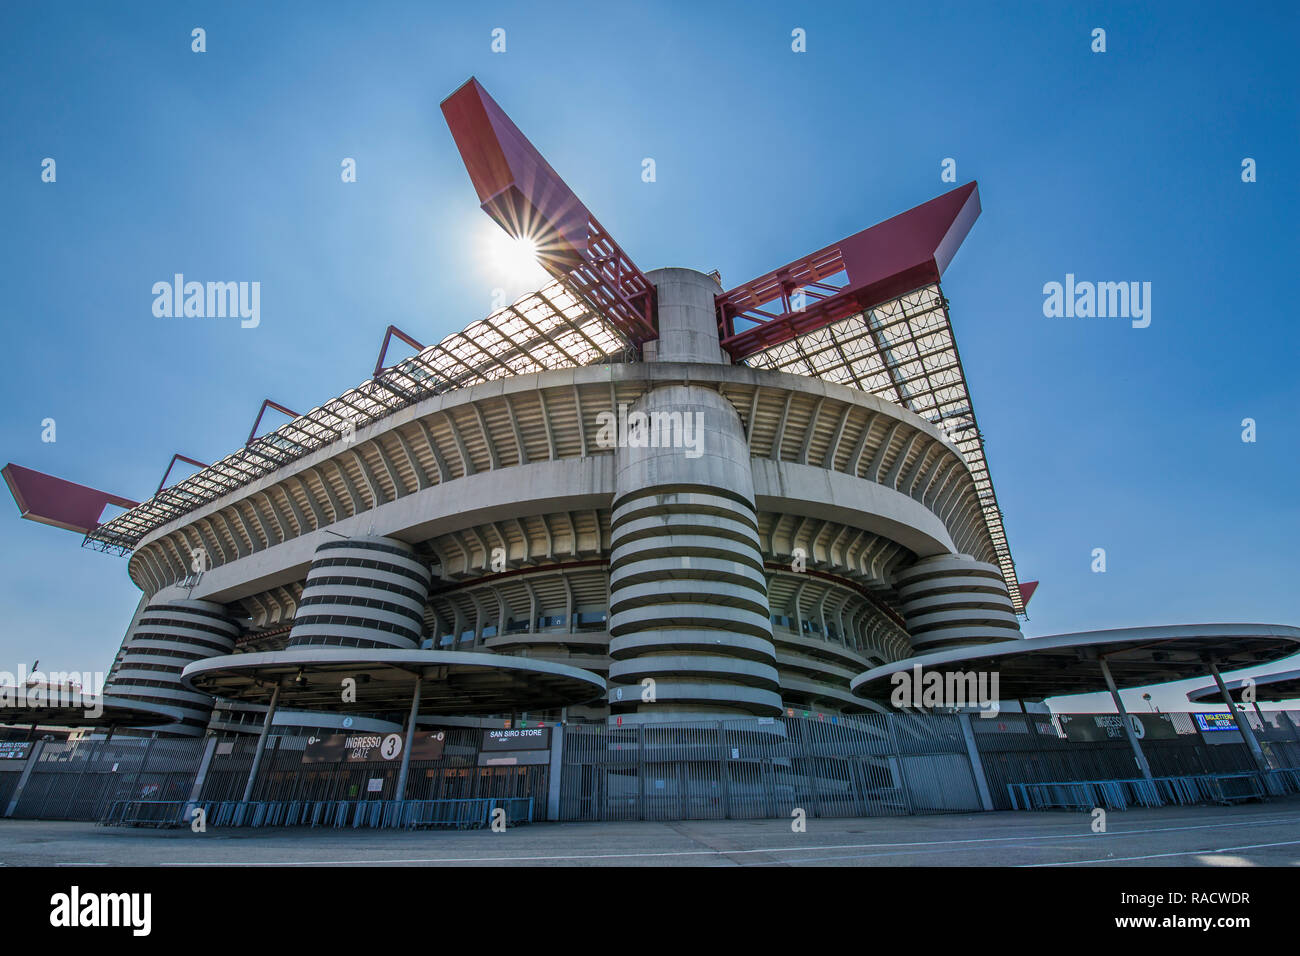 View of San Siro Stadium on a sunny day, Milan, Lombardy, Italy, Europe - Stock Photo